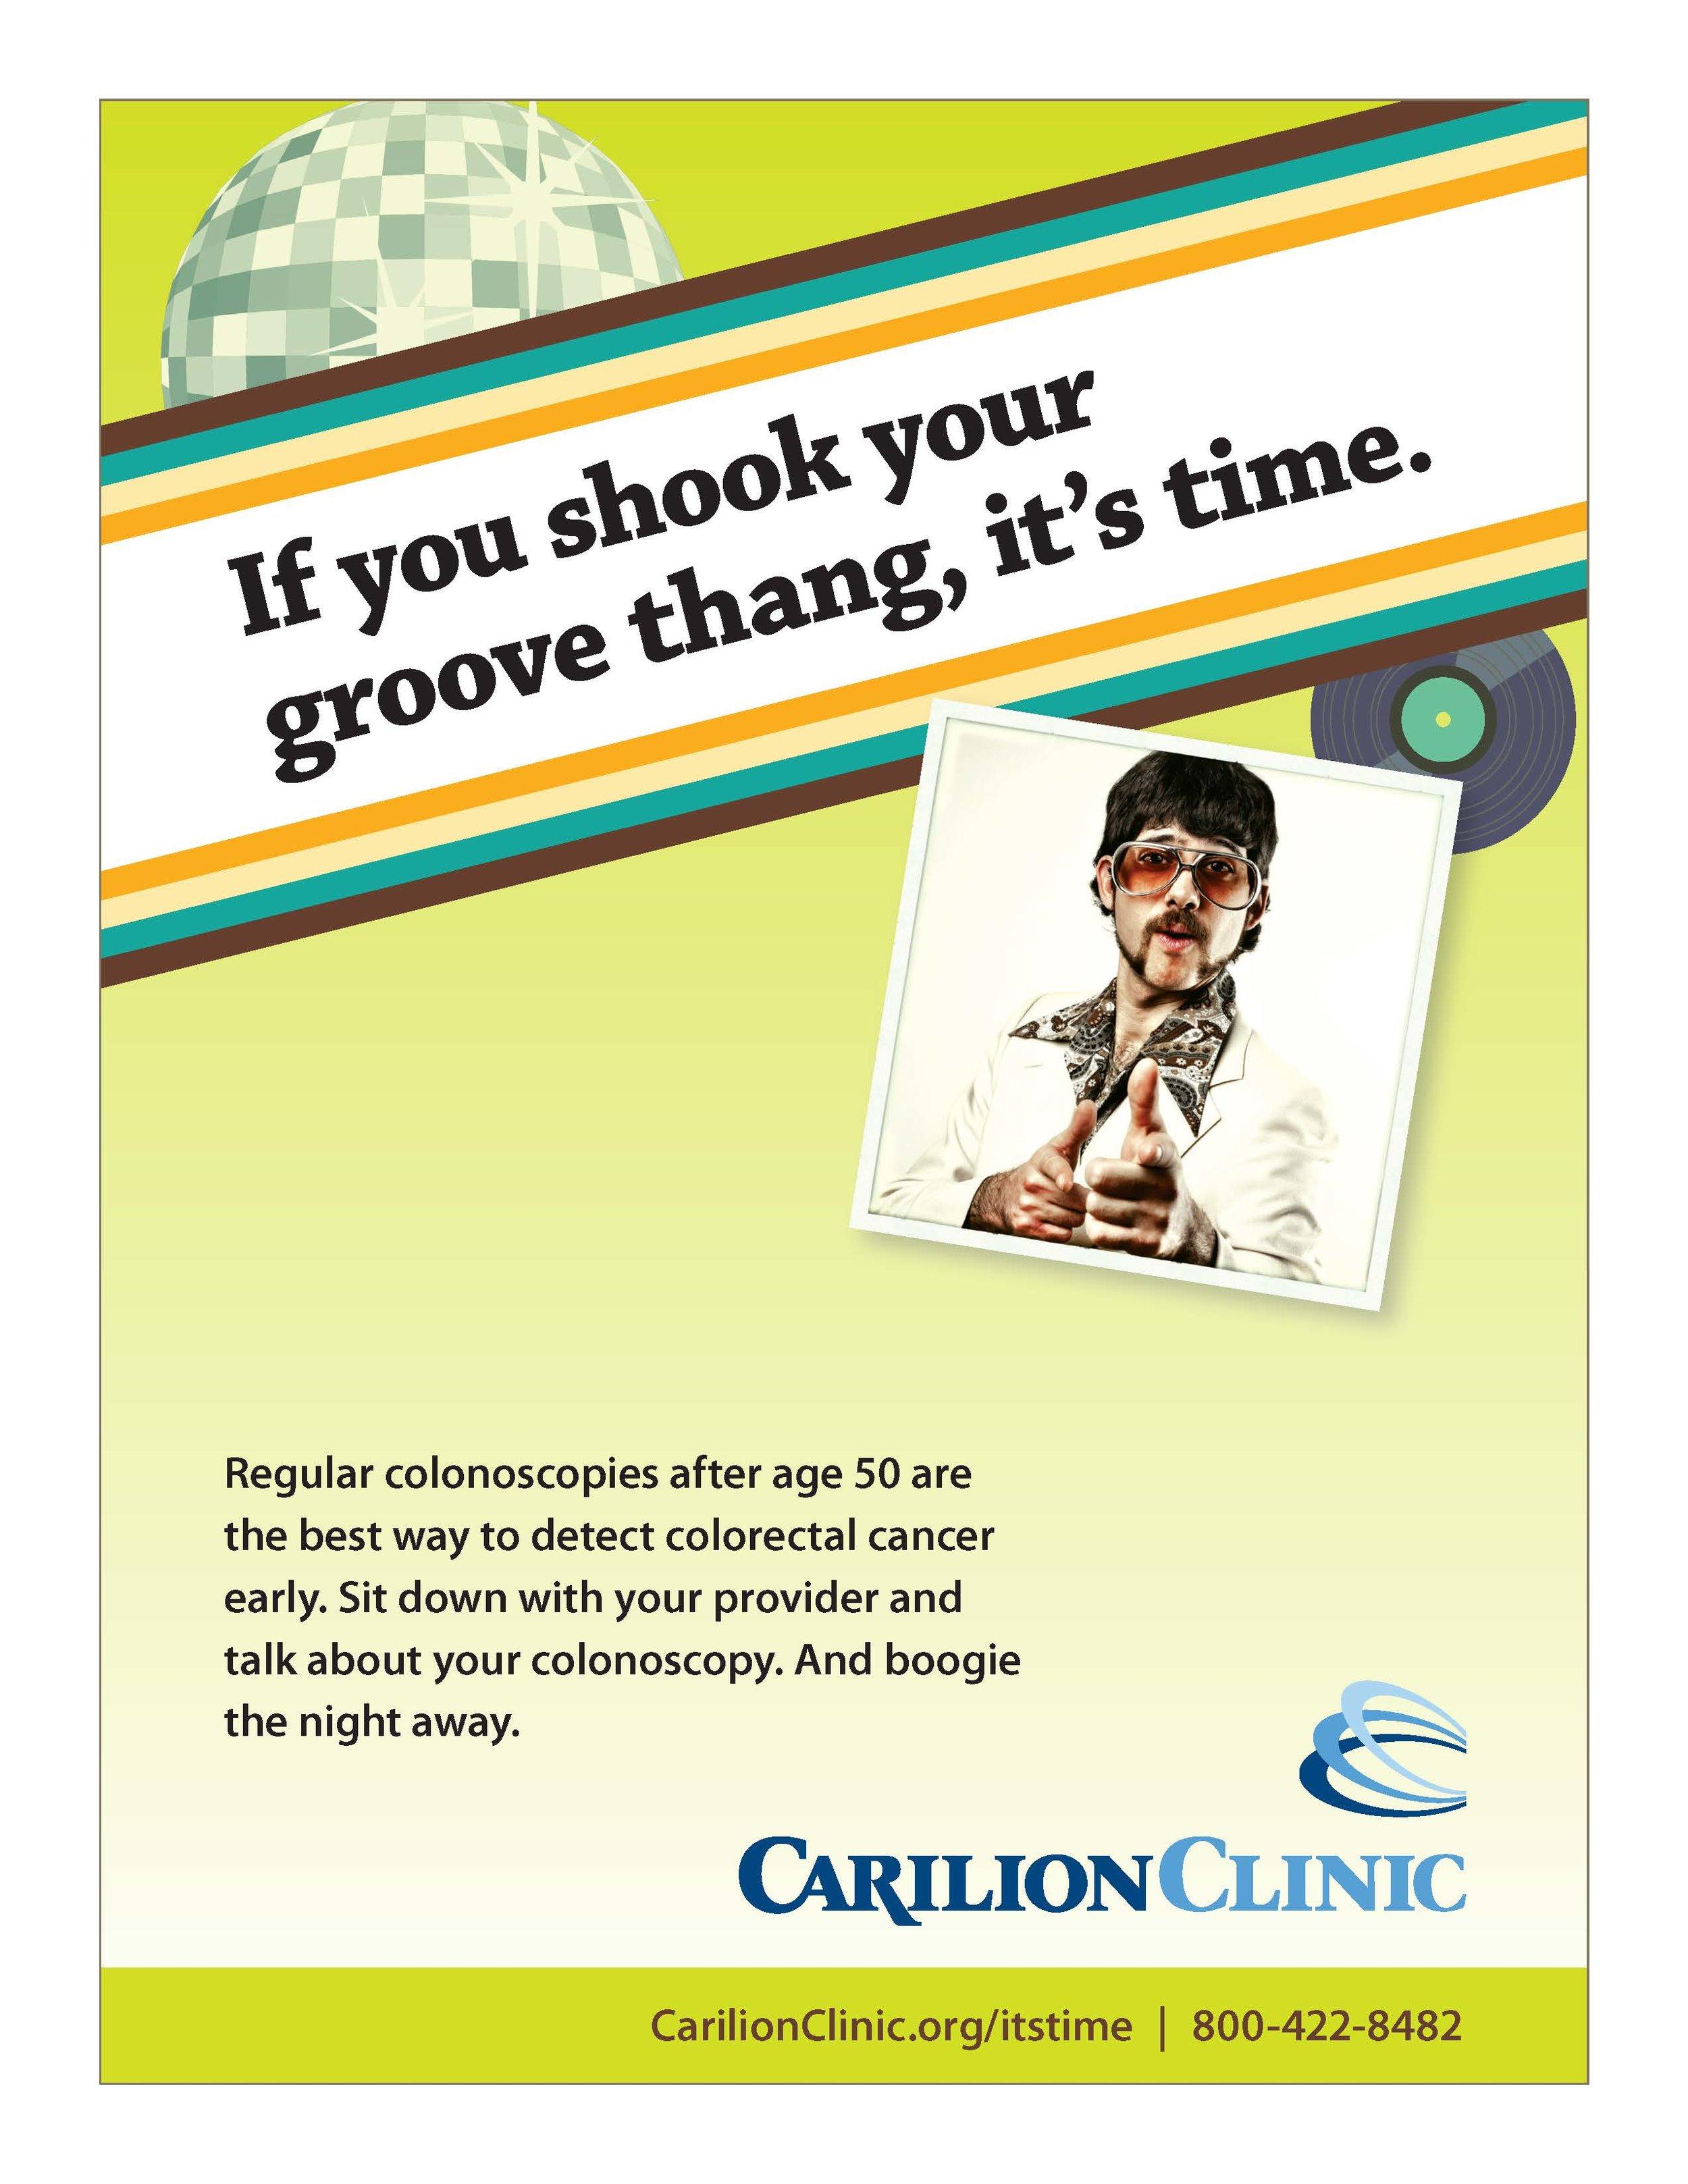 G89462 Colon Cancer Promotion Flyer_1970 Disco Guy.jpg